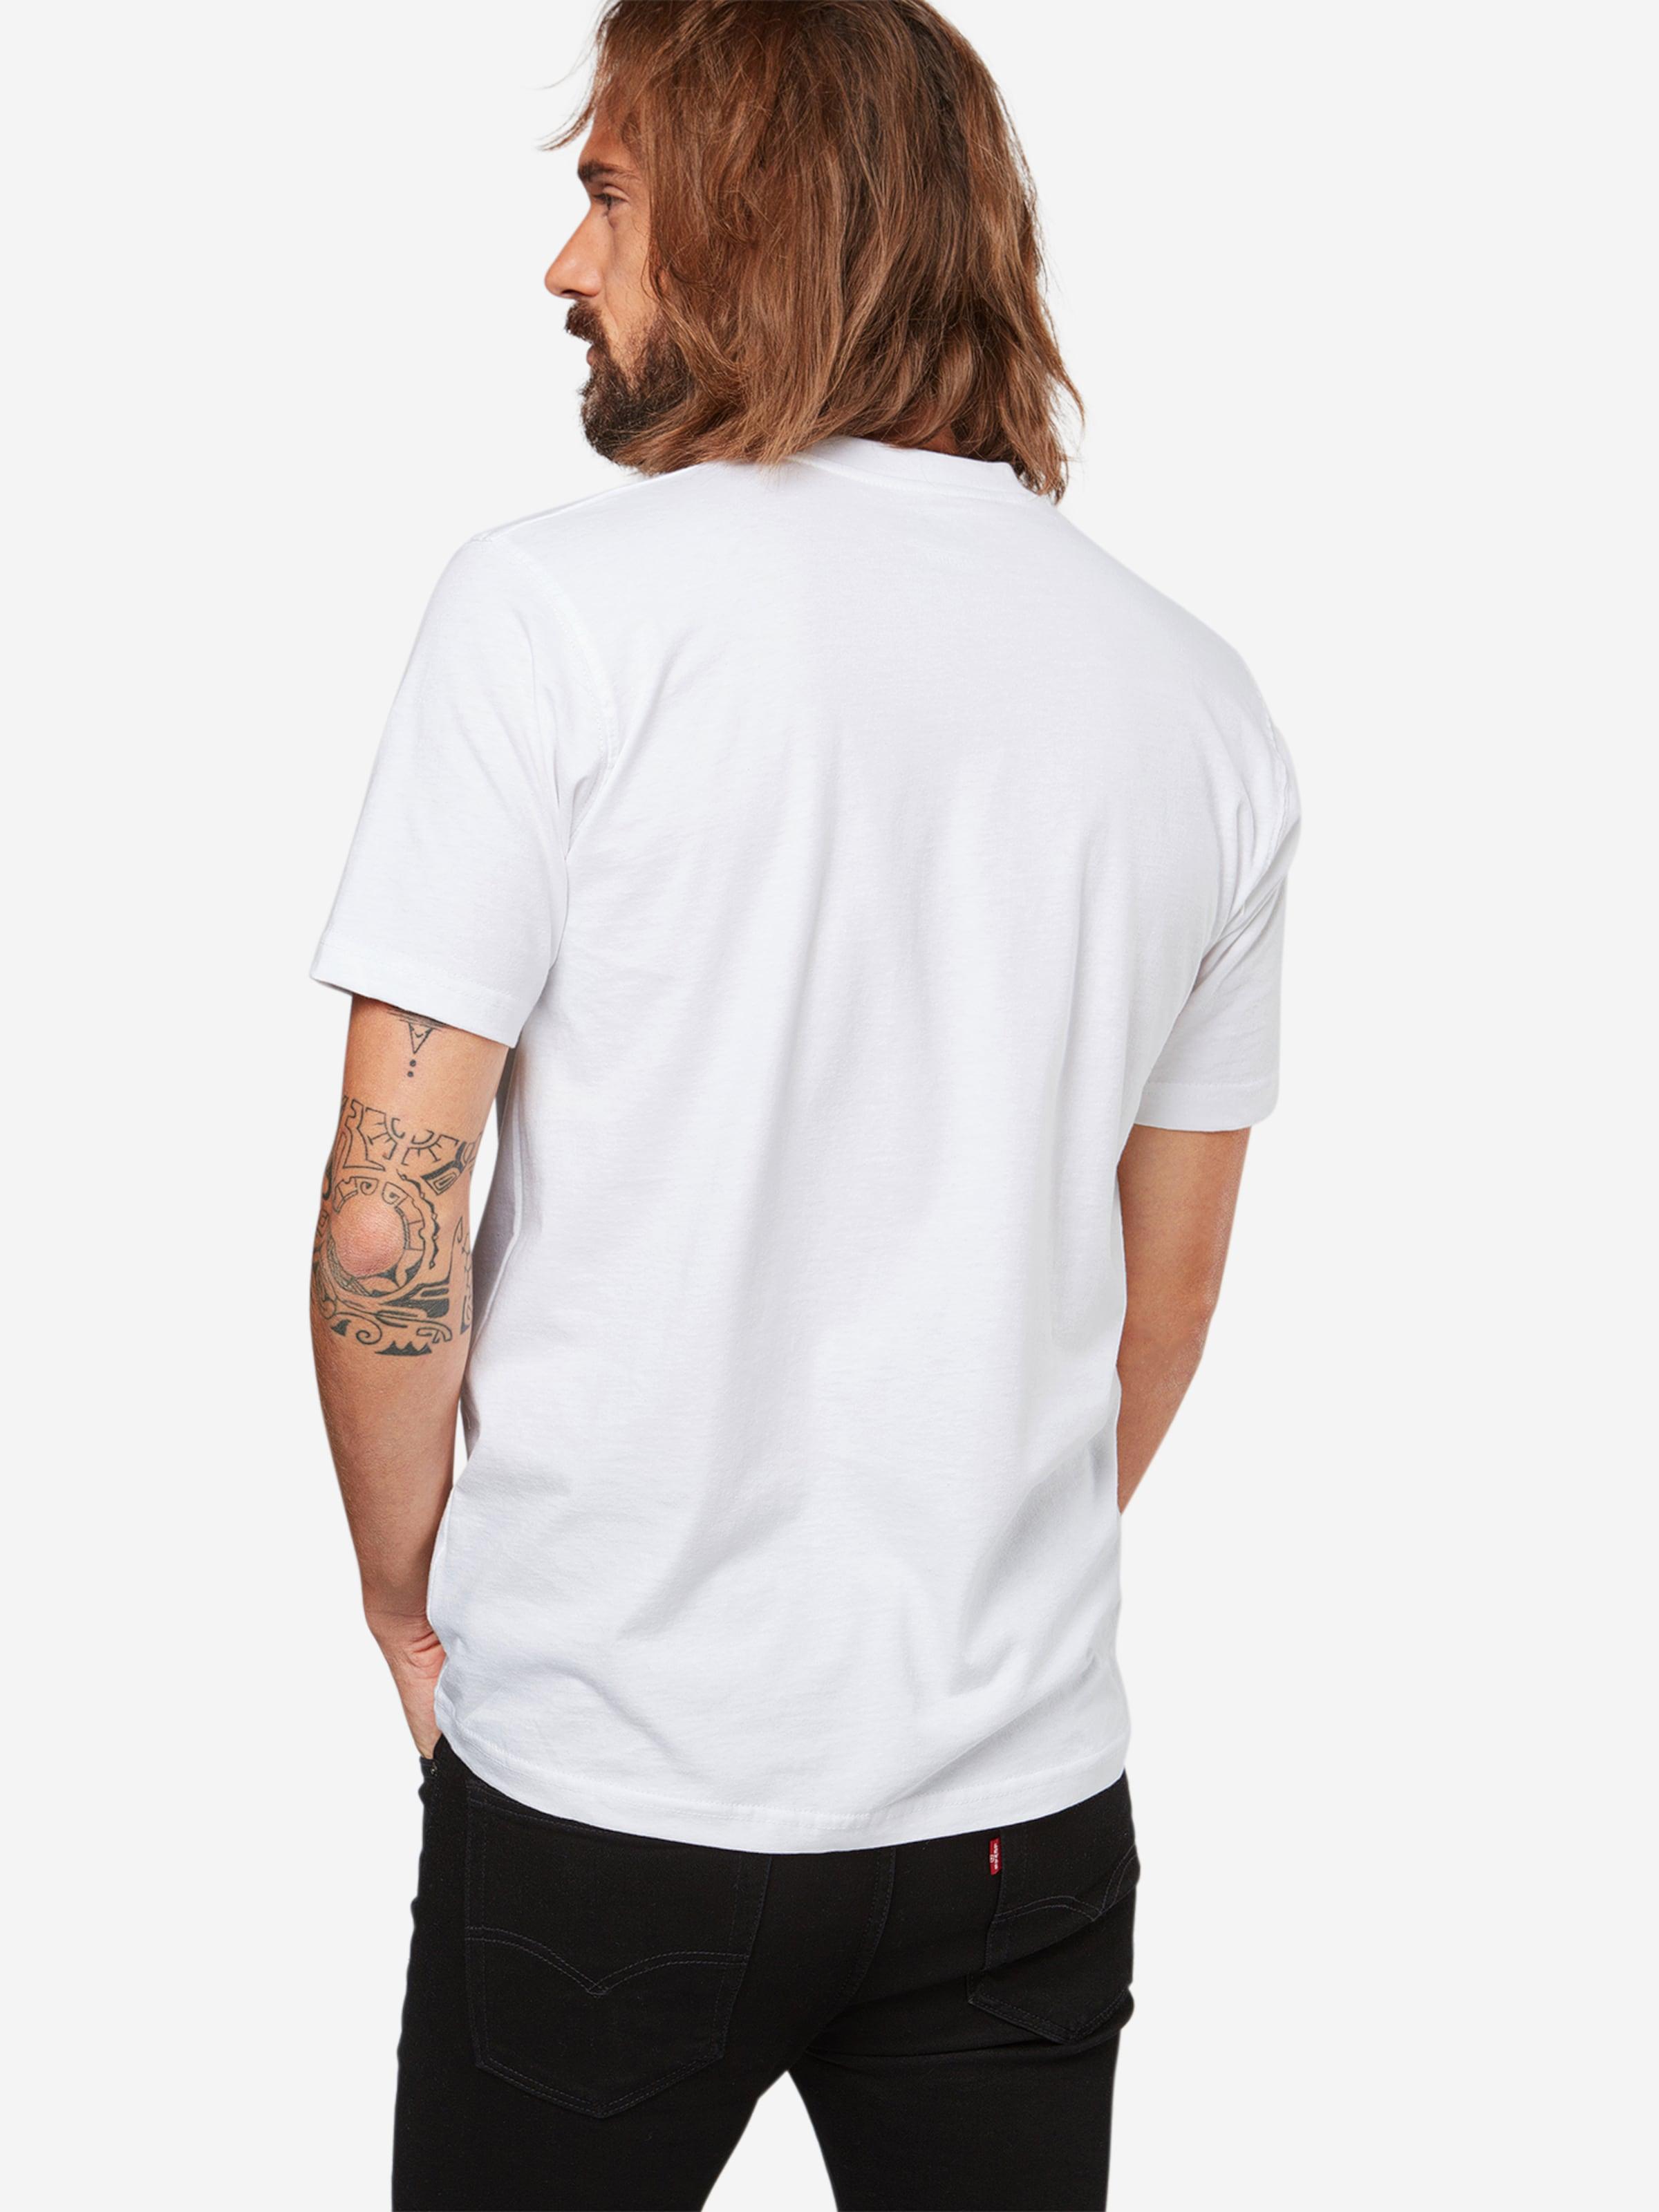 Pack shirt 3er T Dickies Im In Weiß j4LqAR53